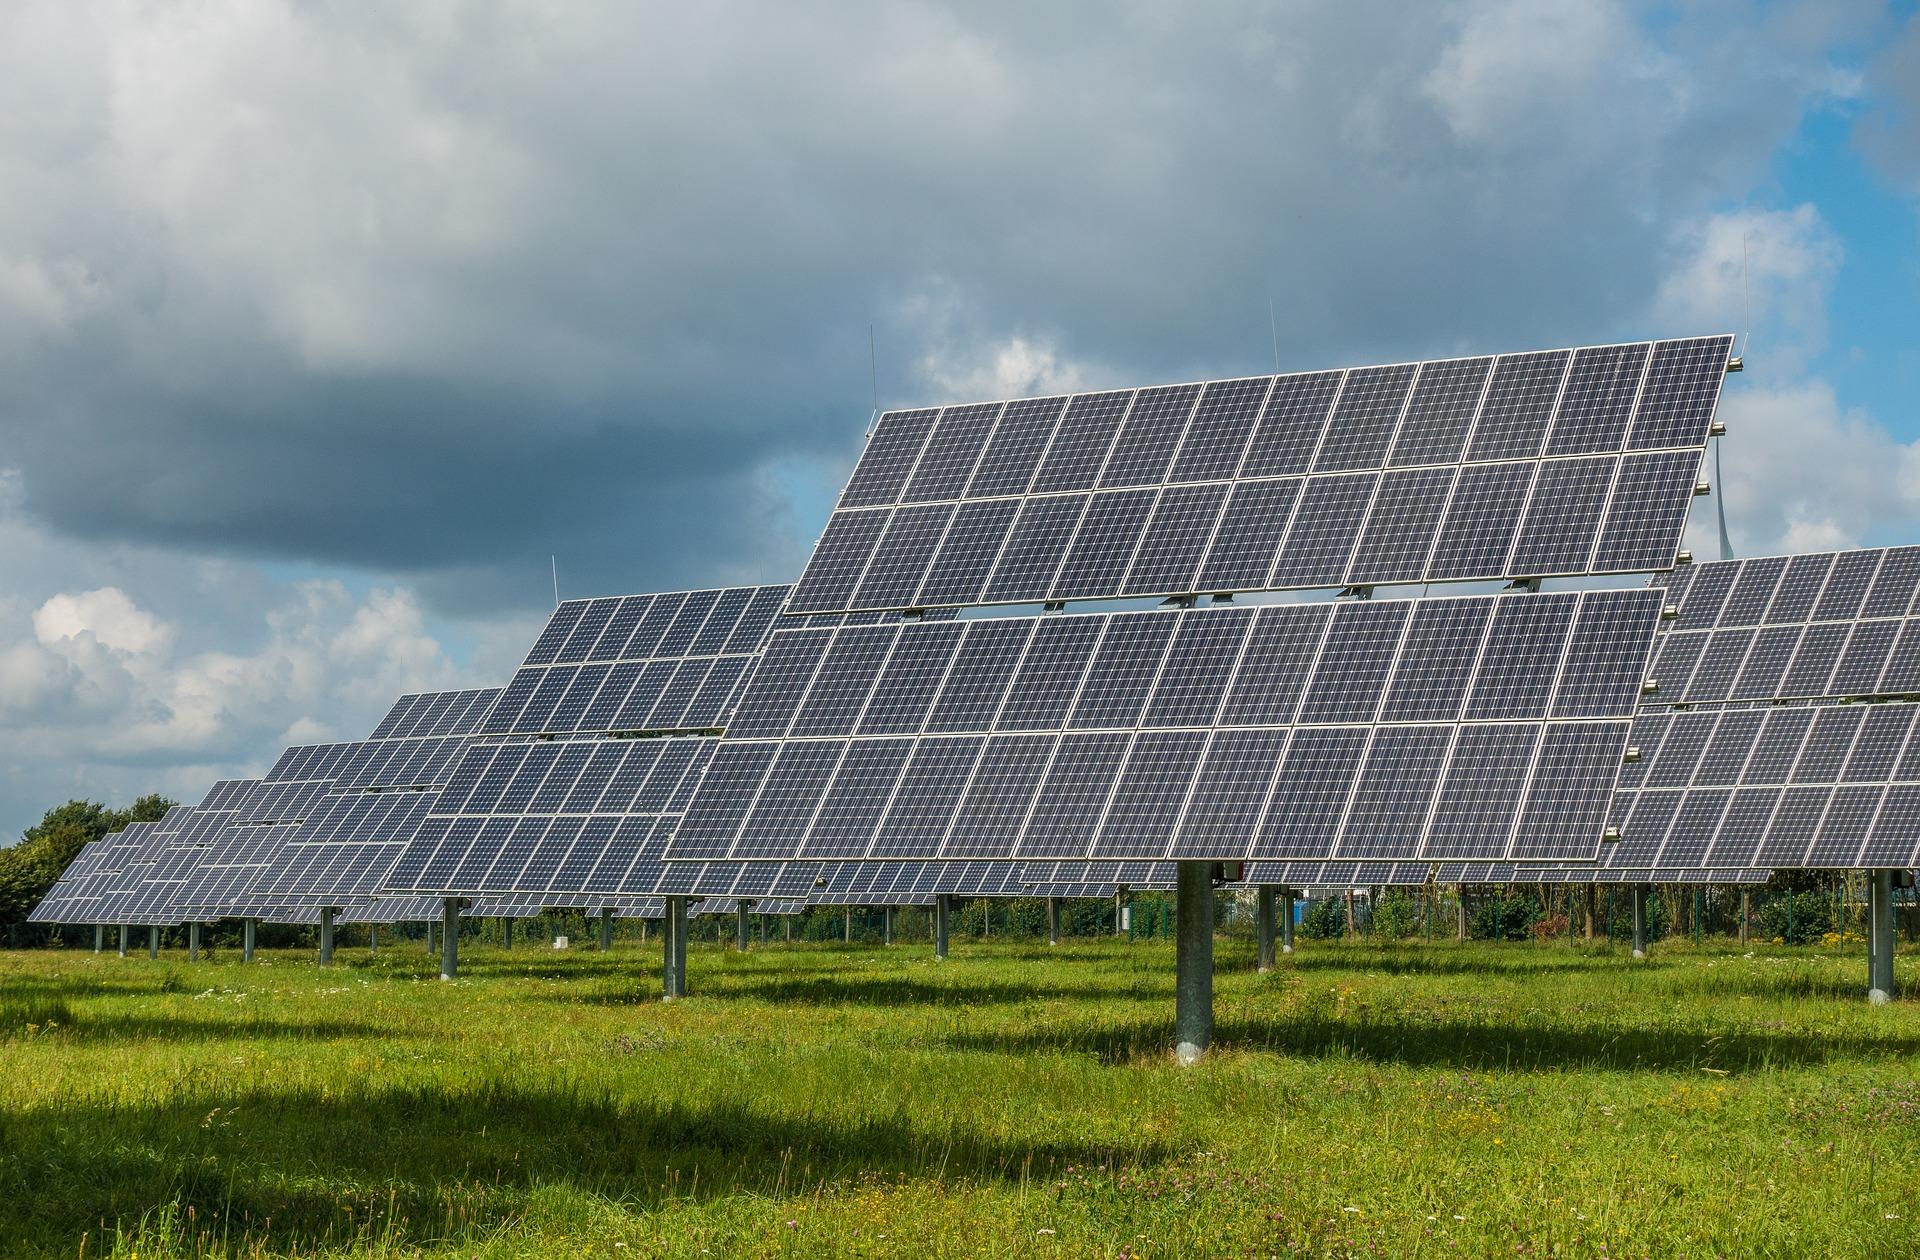 photovoltaic-system-2742304_1920.jpg